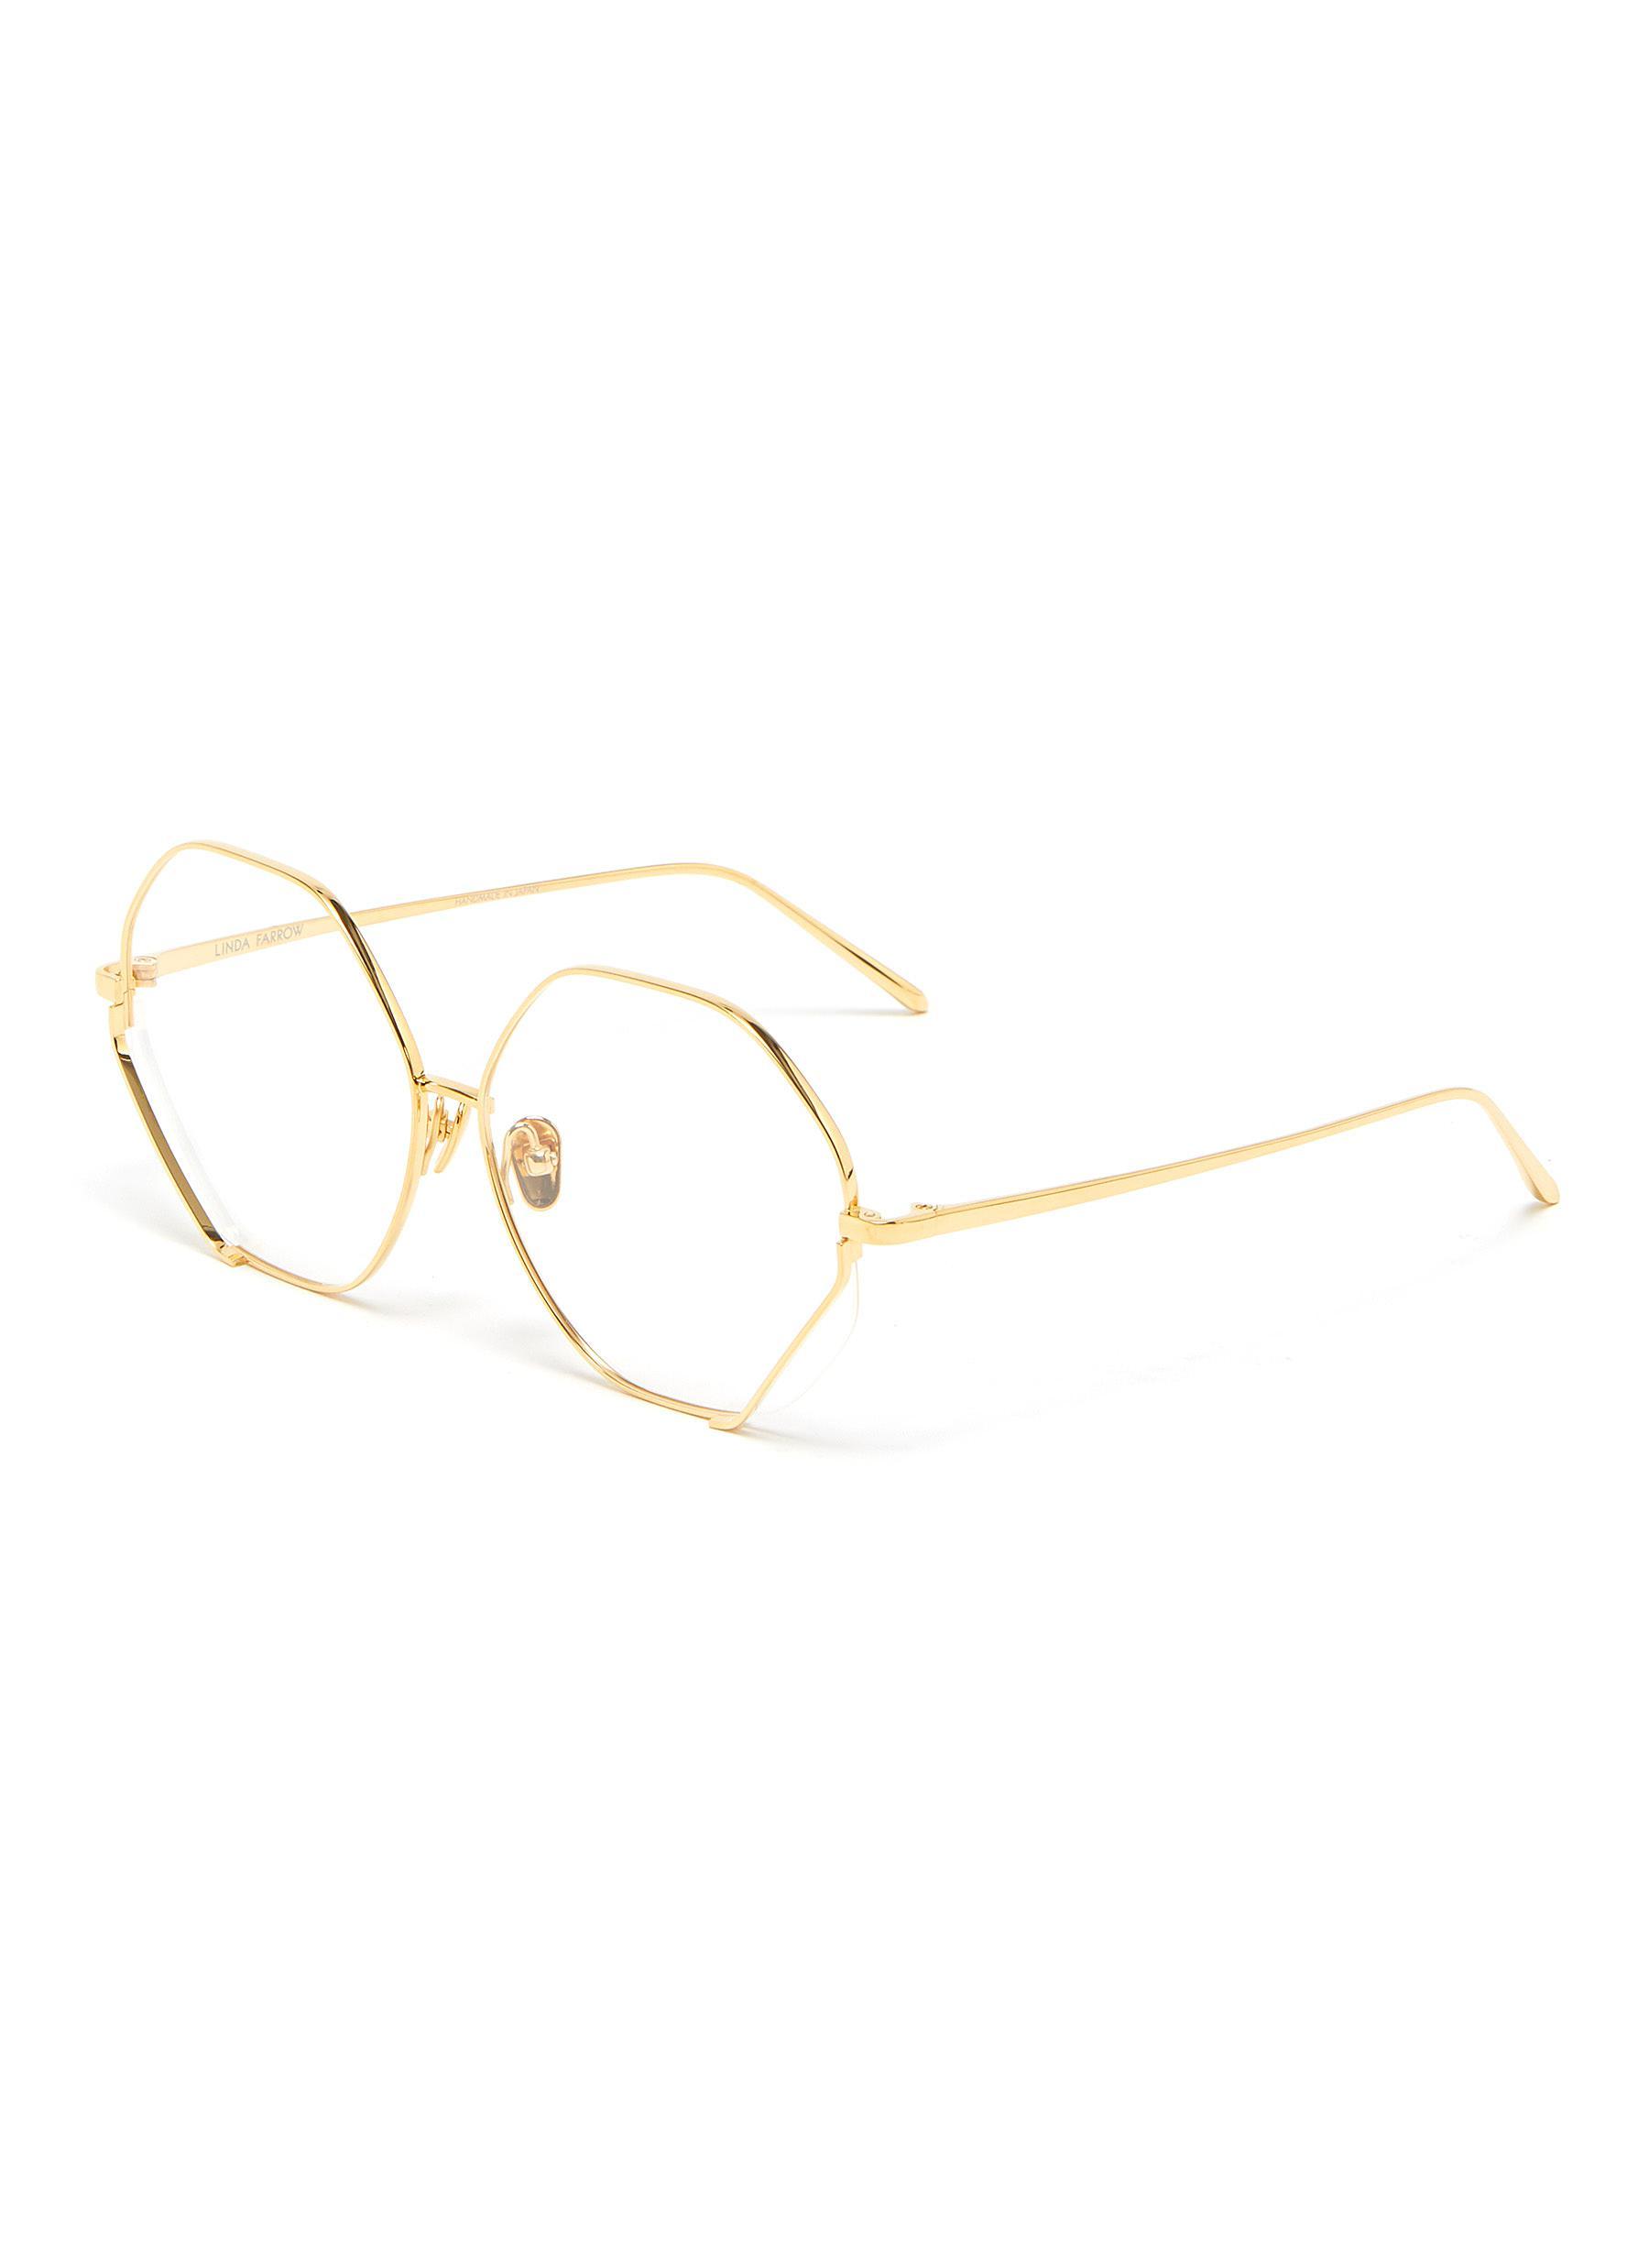 'Fawcet' Expose Cut Hexagonal Frame Optical Glasses